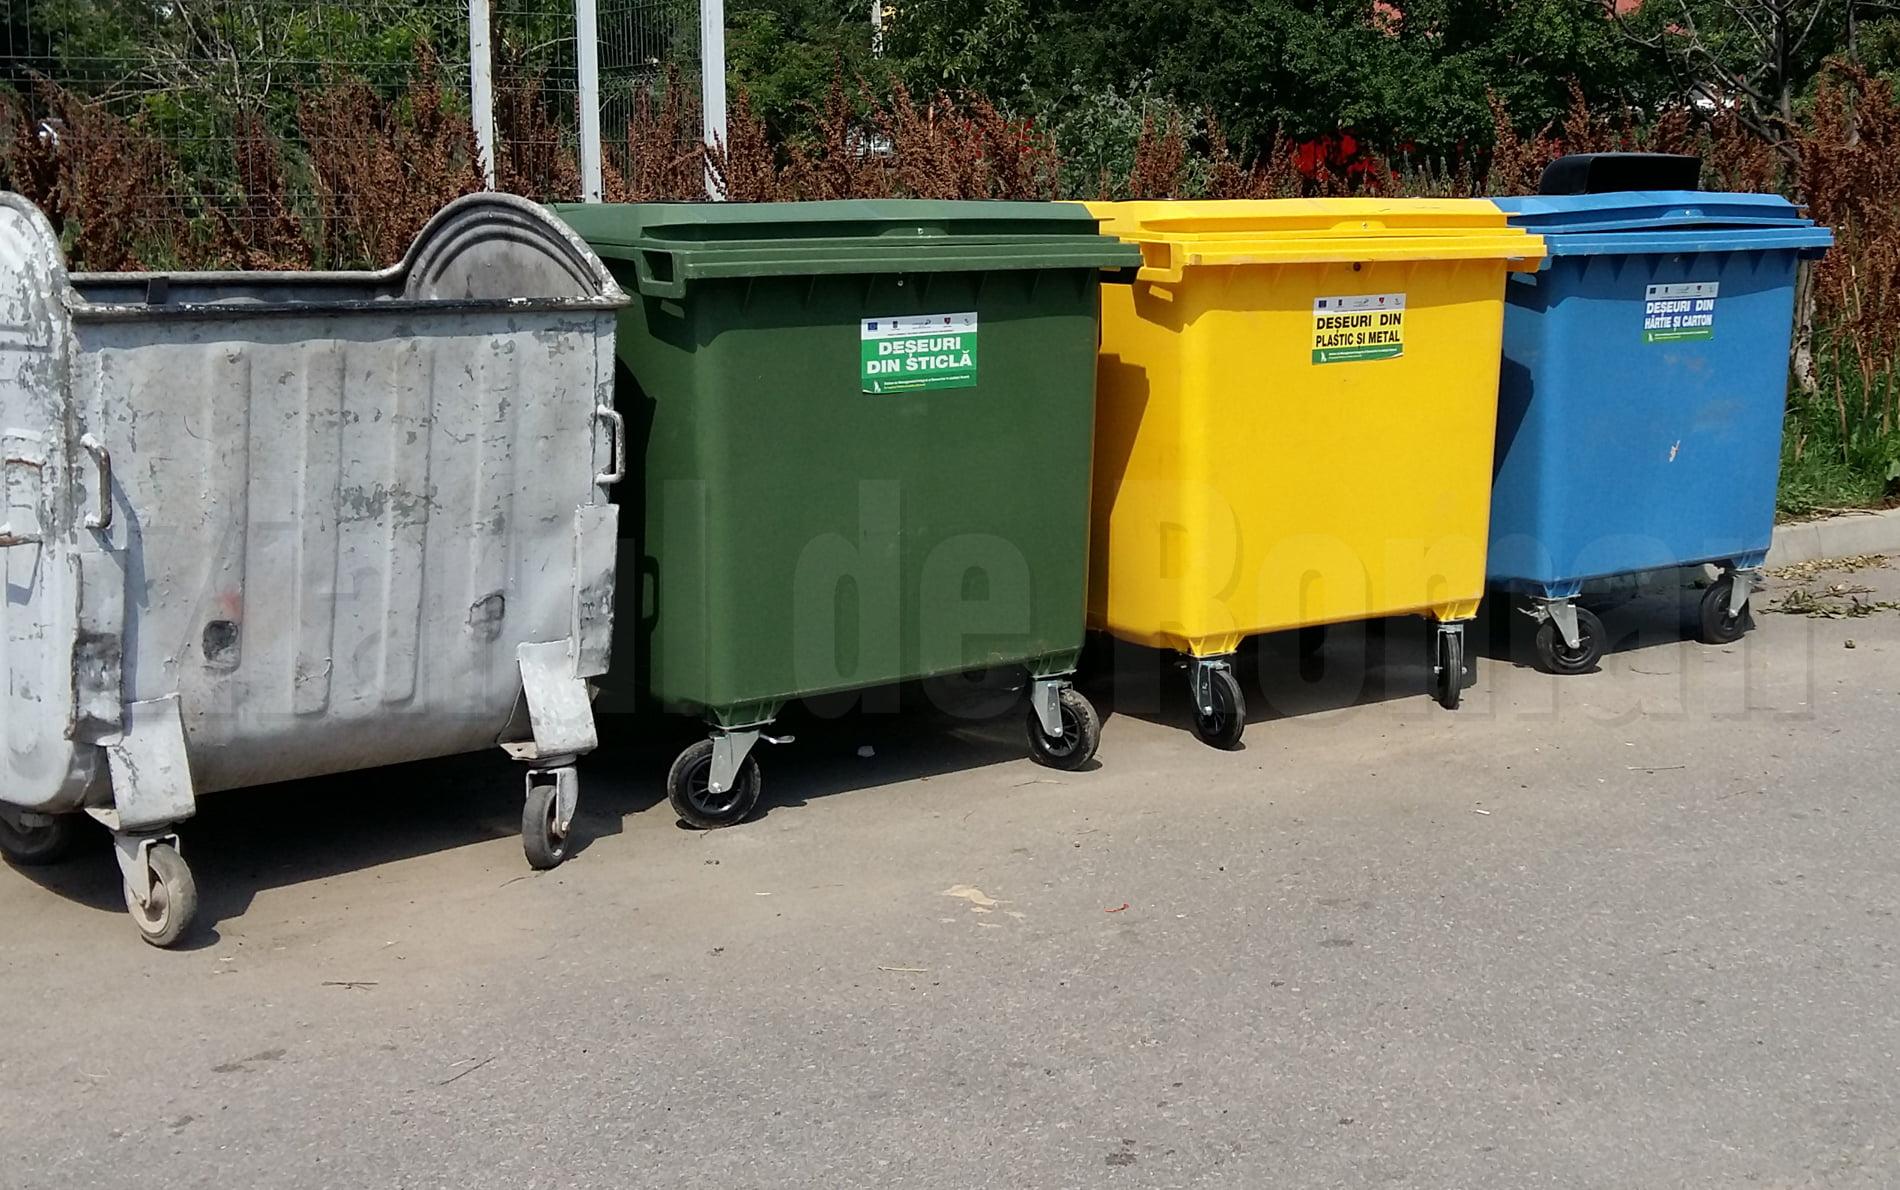 Polițiștii locali vor monitoriza platformele de gunoi